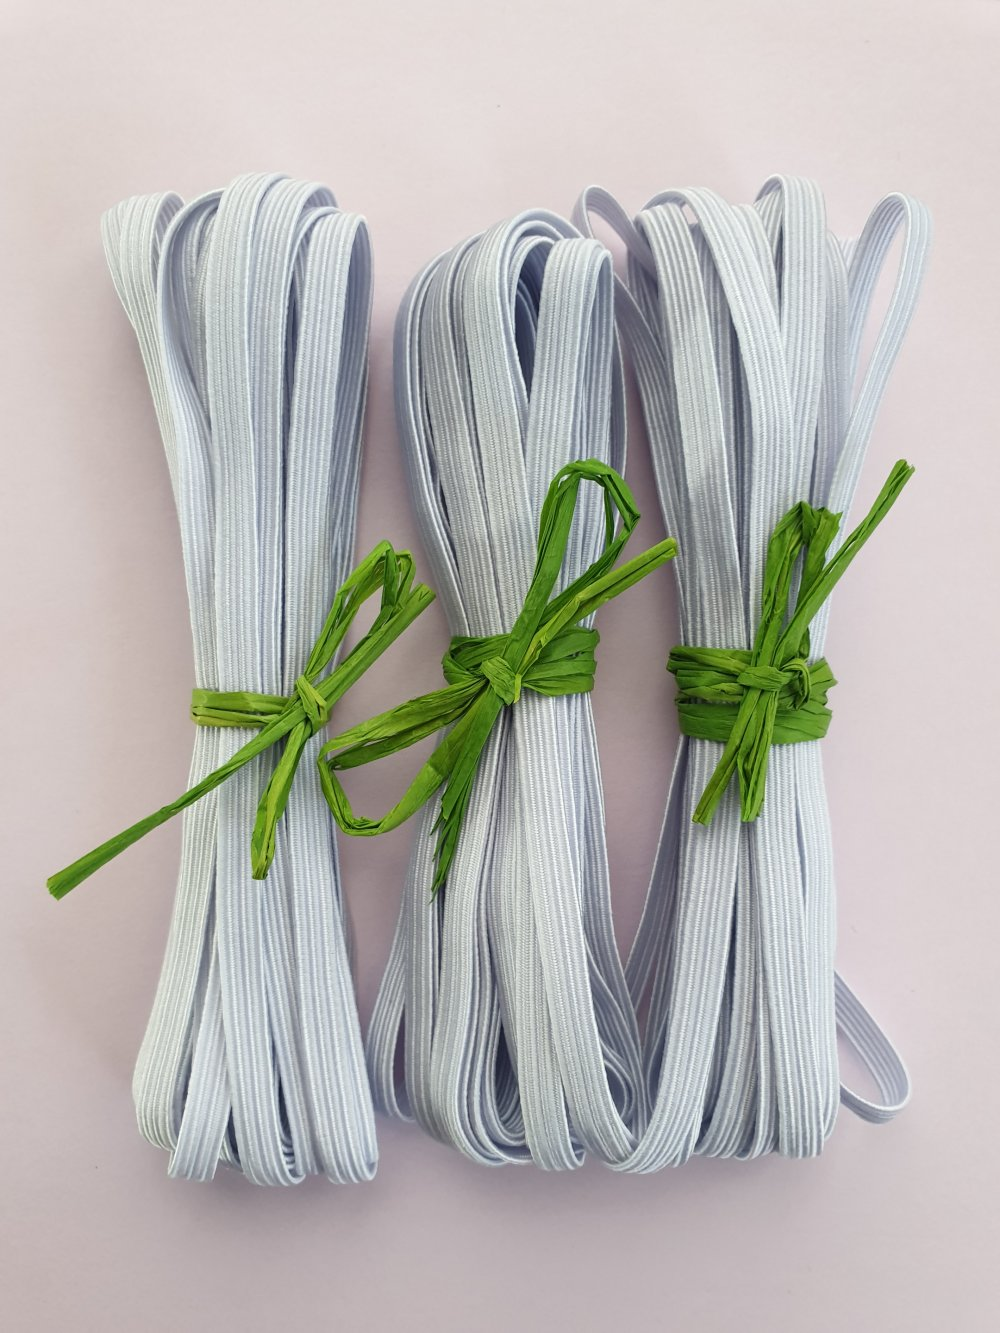 Elastique 15M, tresse élastique, elastiques  5 mm,blanc.